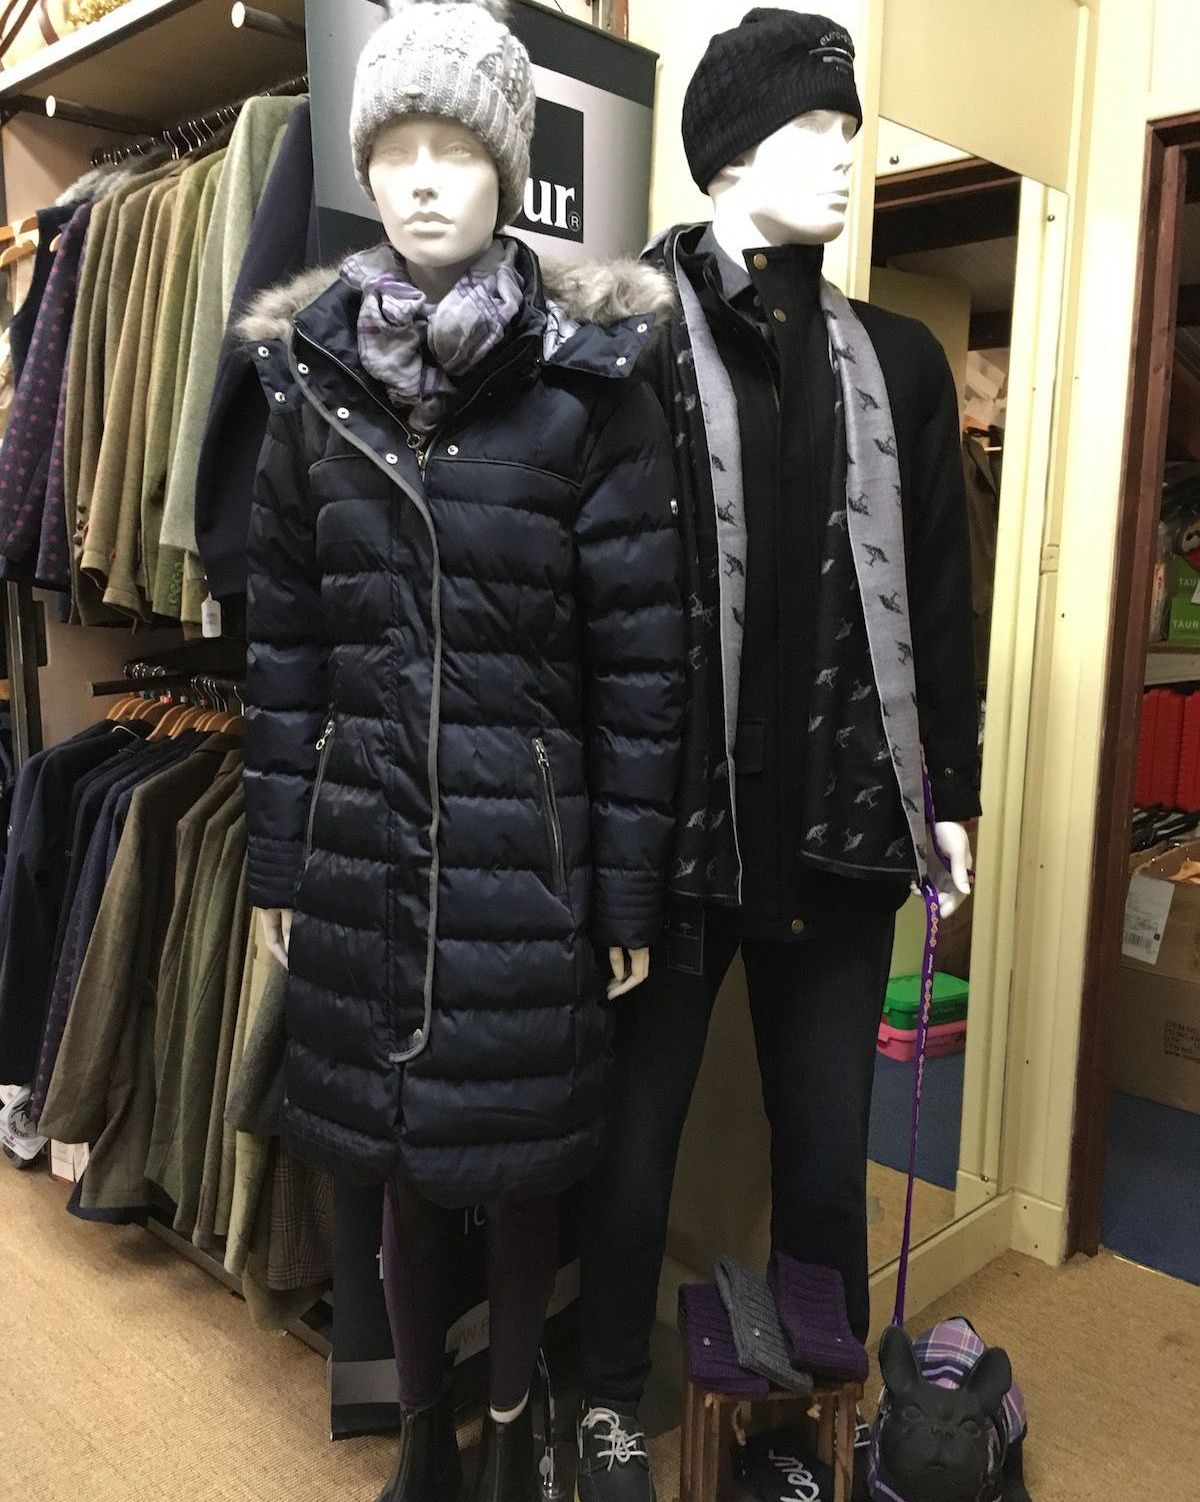 Lifestyle clothing at Riseholme Feeds